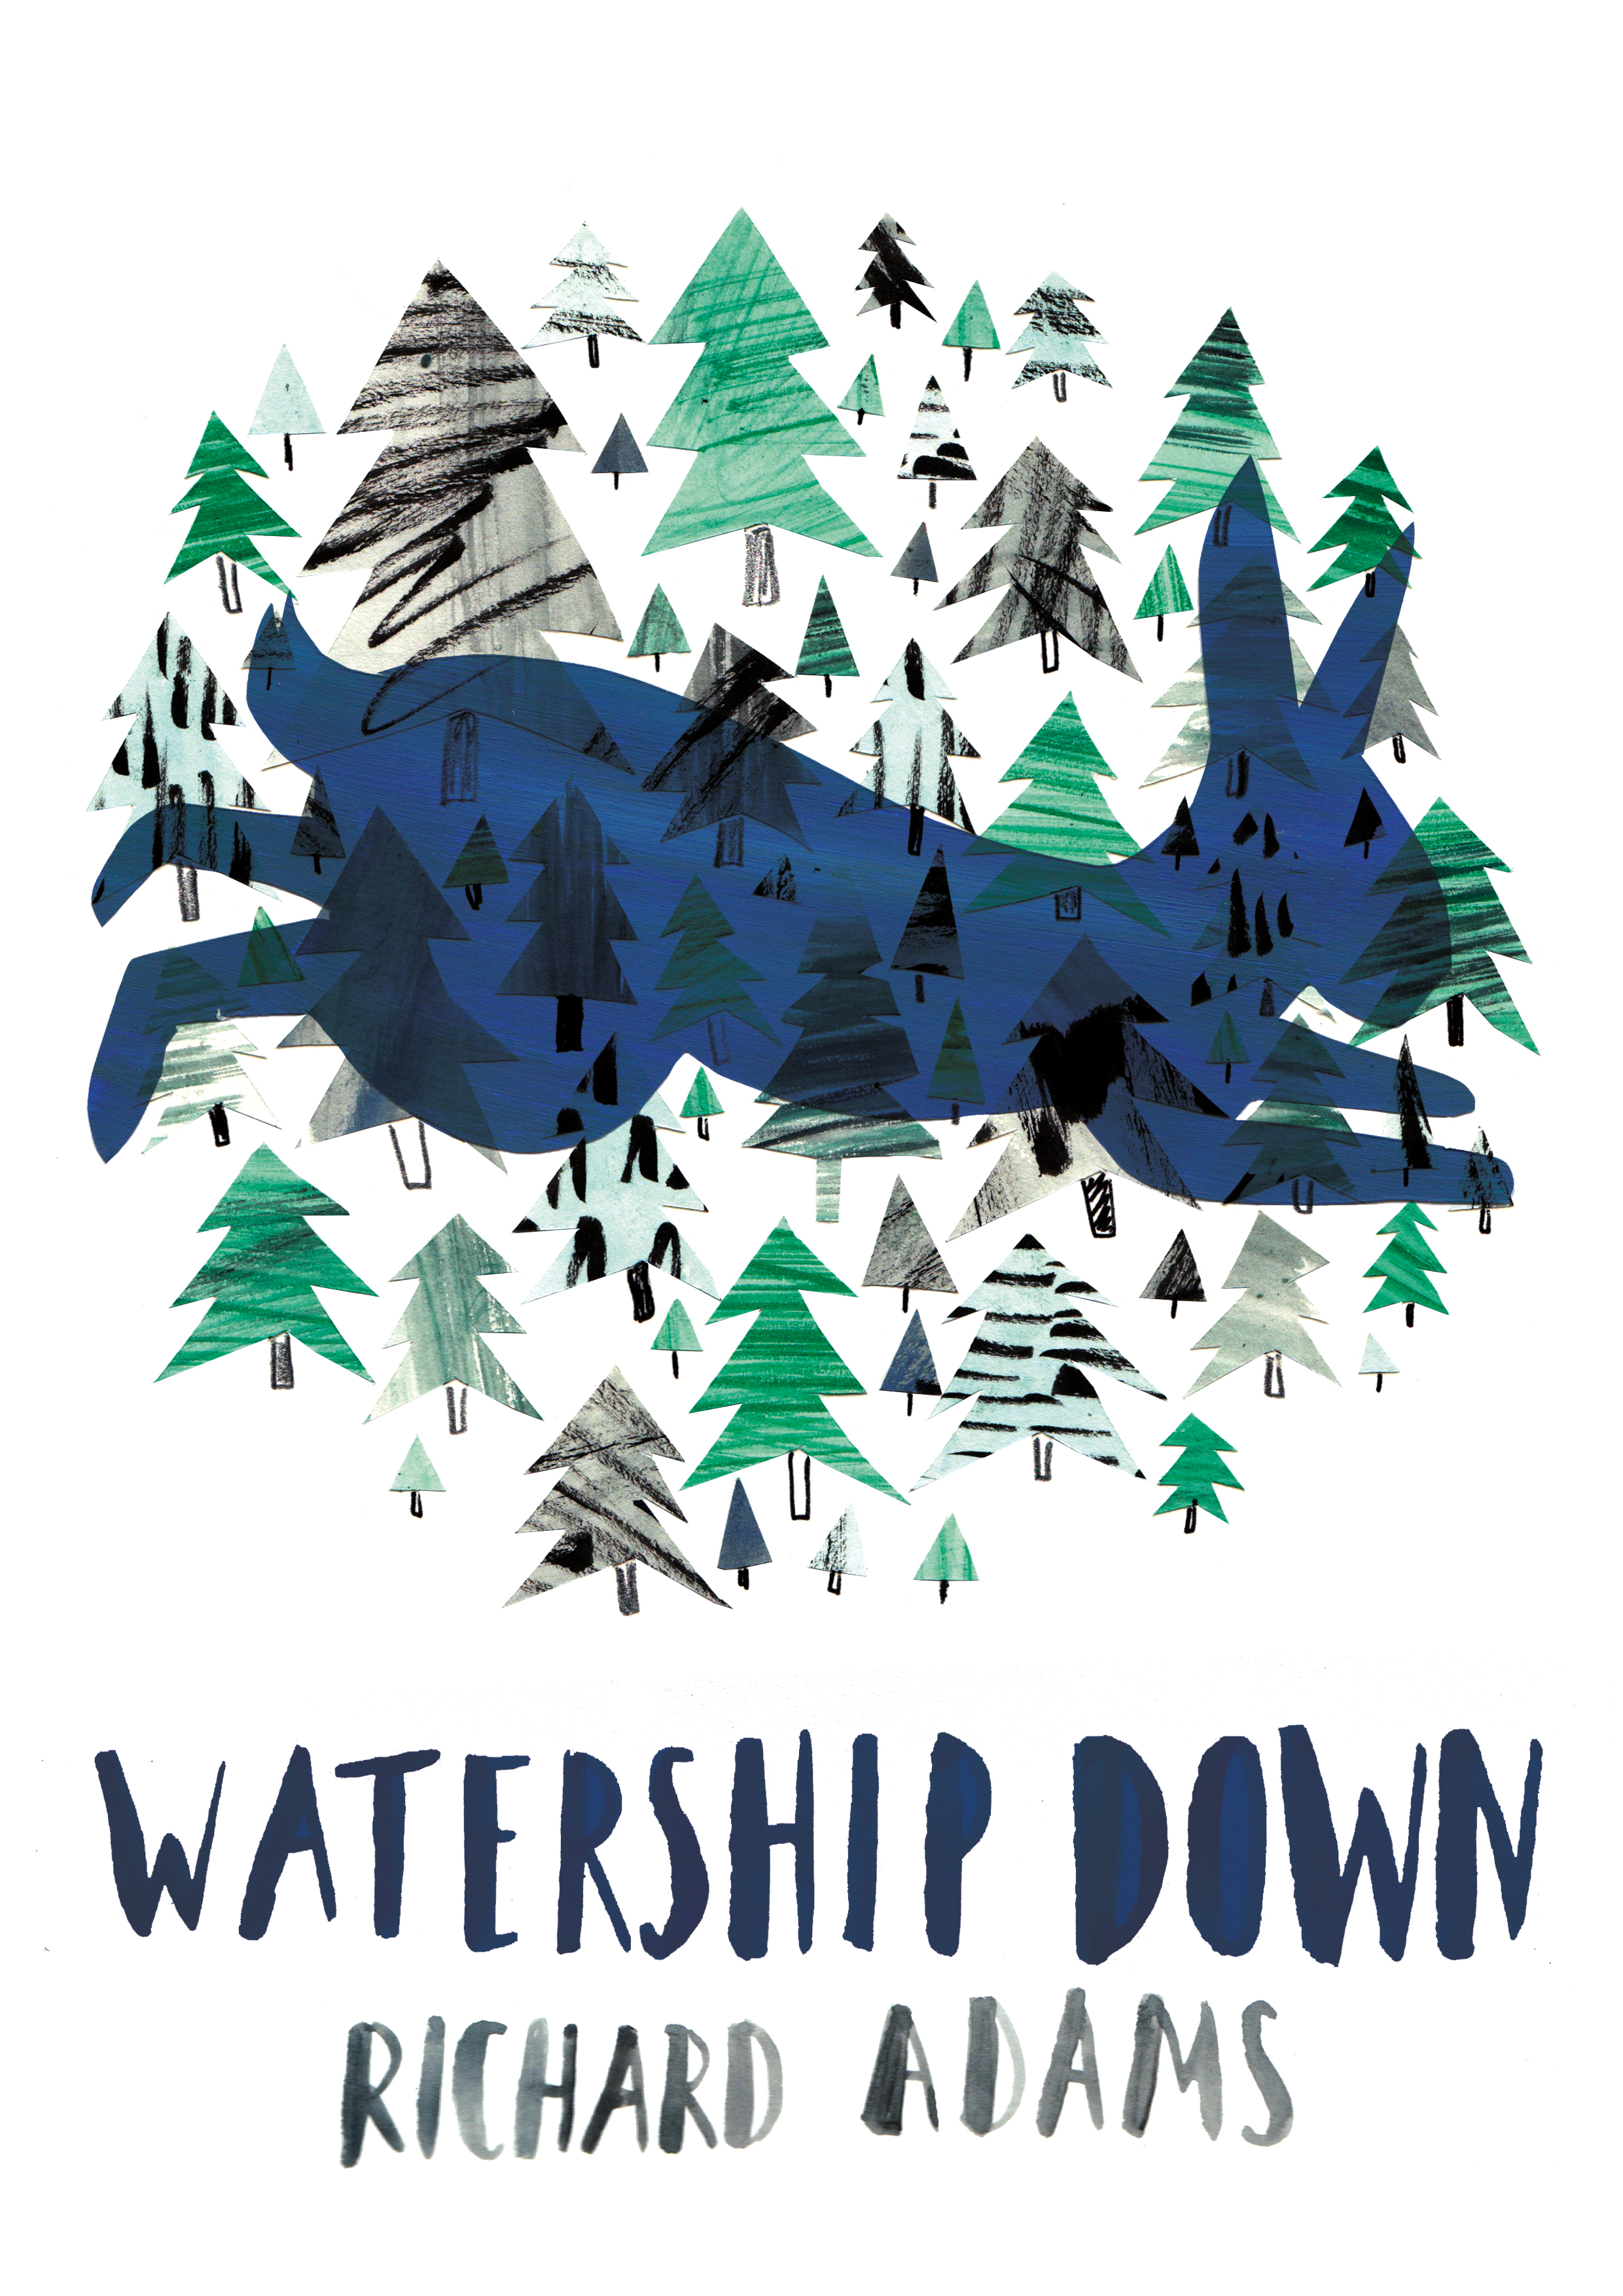 watership down cover.jpg